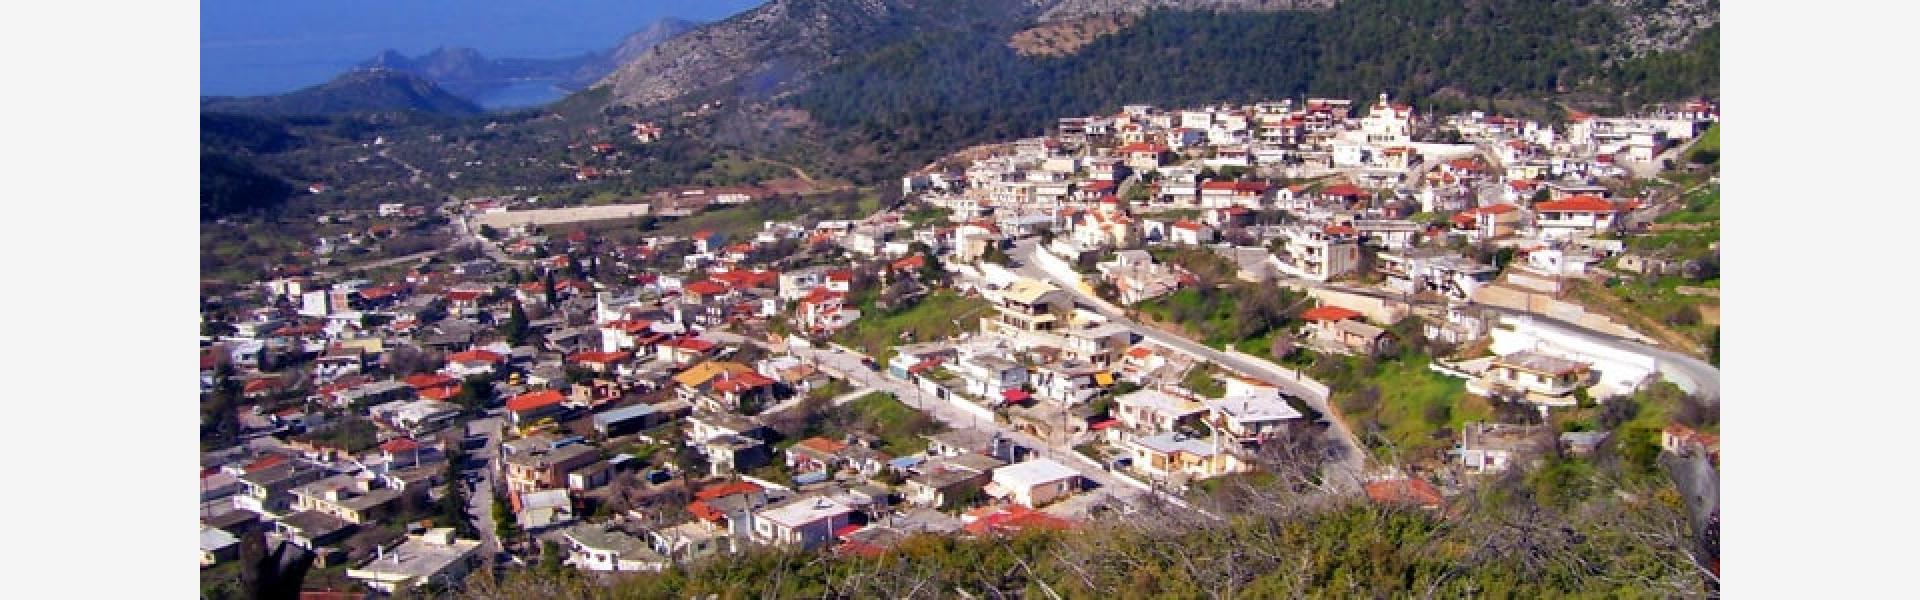 Perachora Village